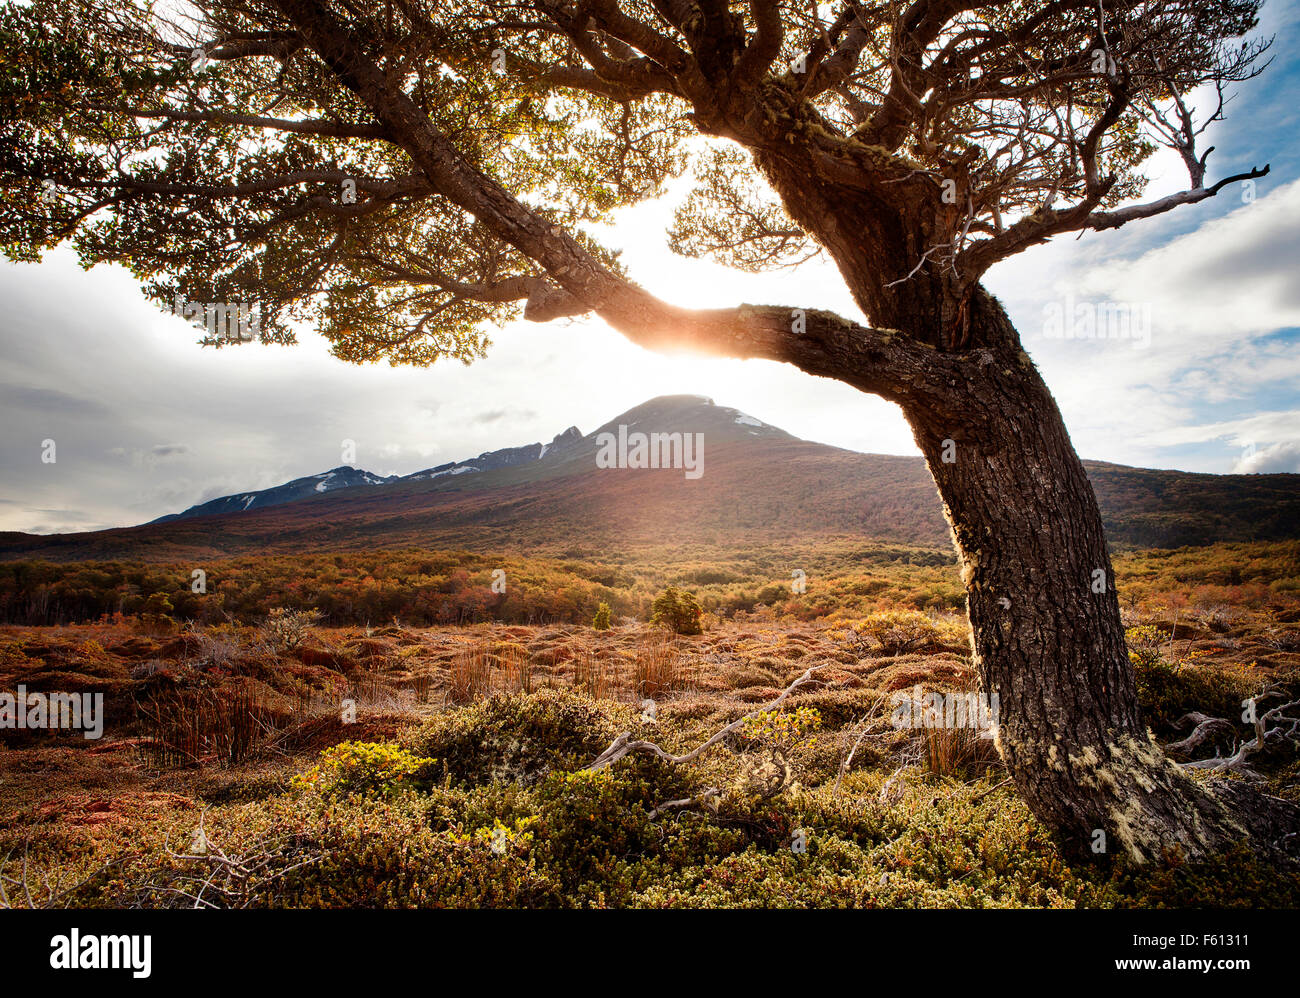 Single tree in front of mountain, Archipielago Cormoranes, Tierra del Fuego National Park, Argentina - Stock Image